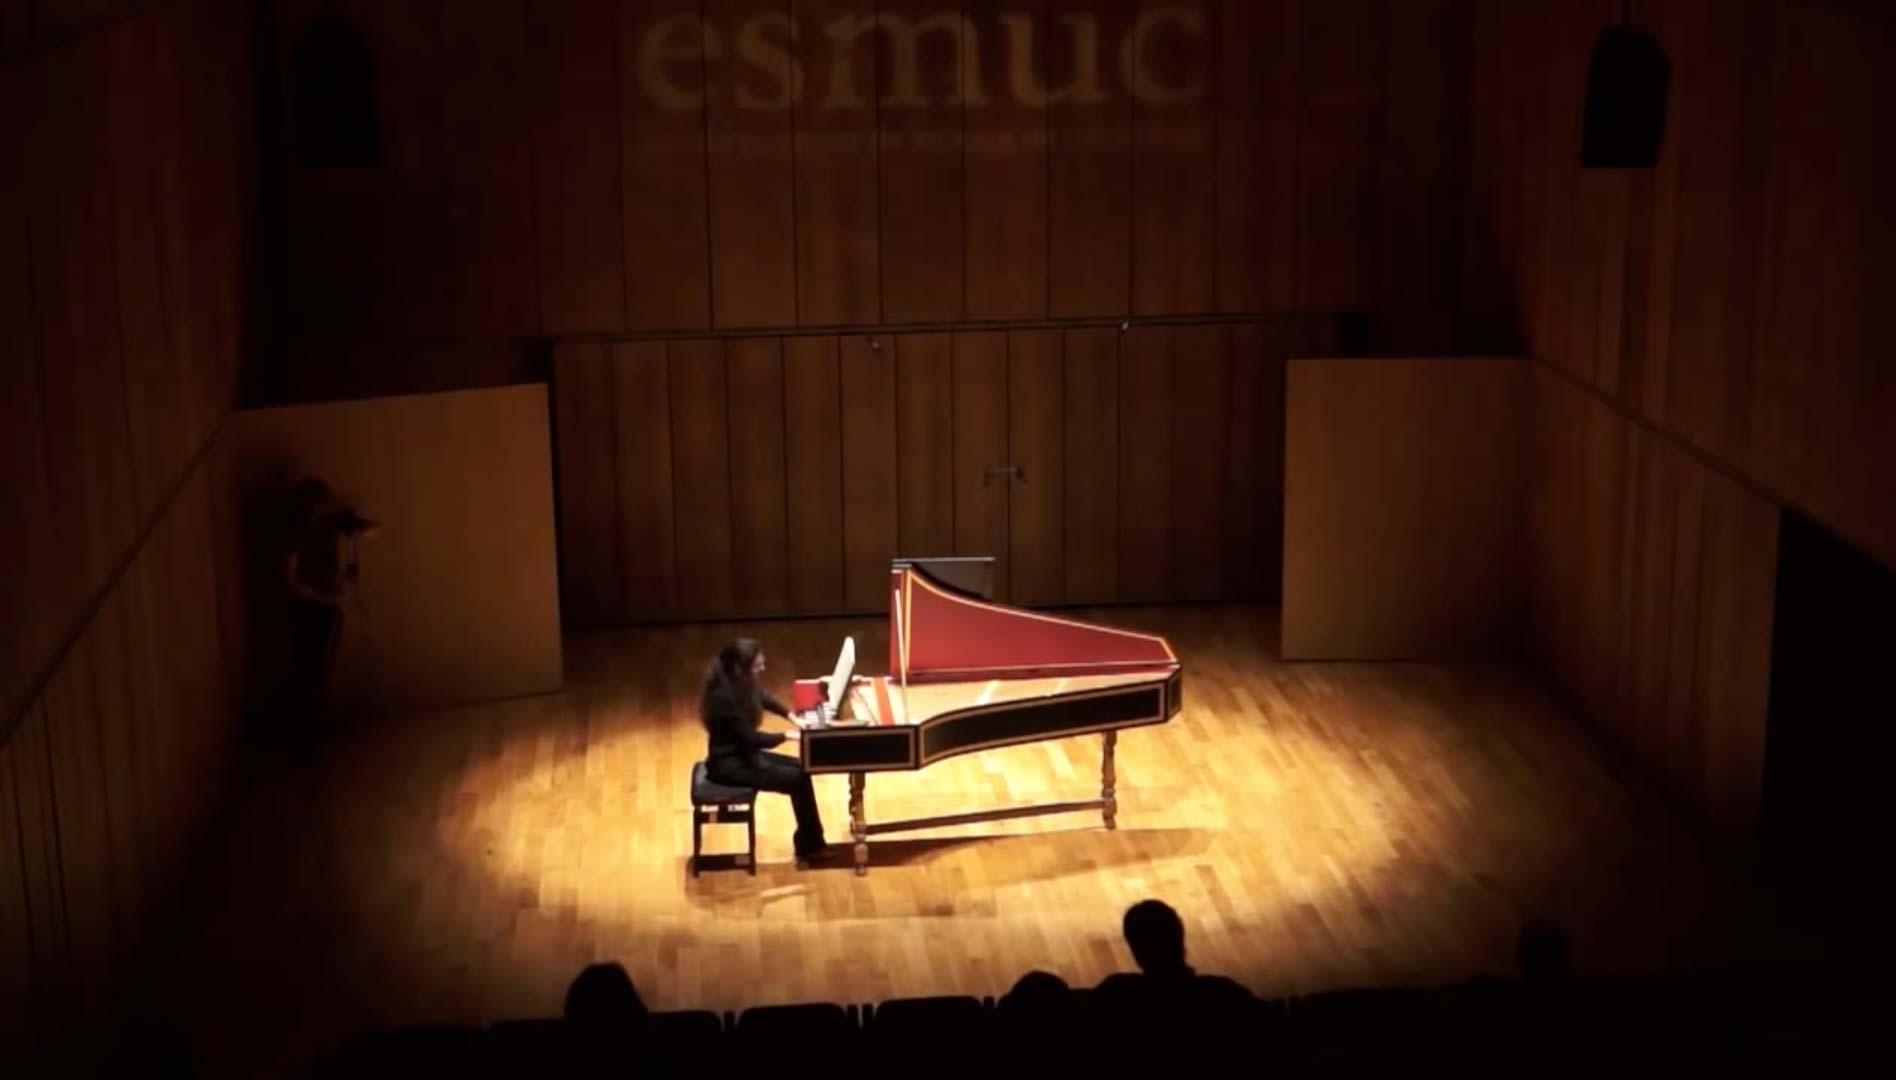 J. S. Bach - Partita BWV 825, Sarabande - Valentina Colonna, clavicembalo